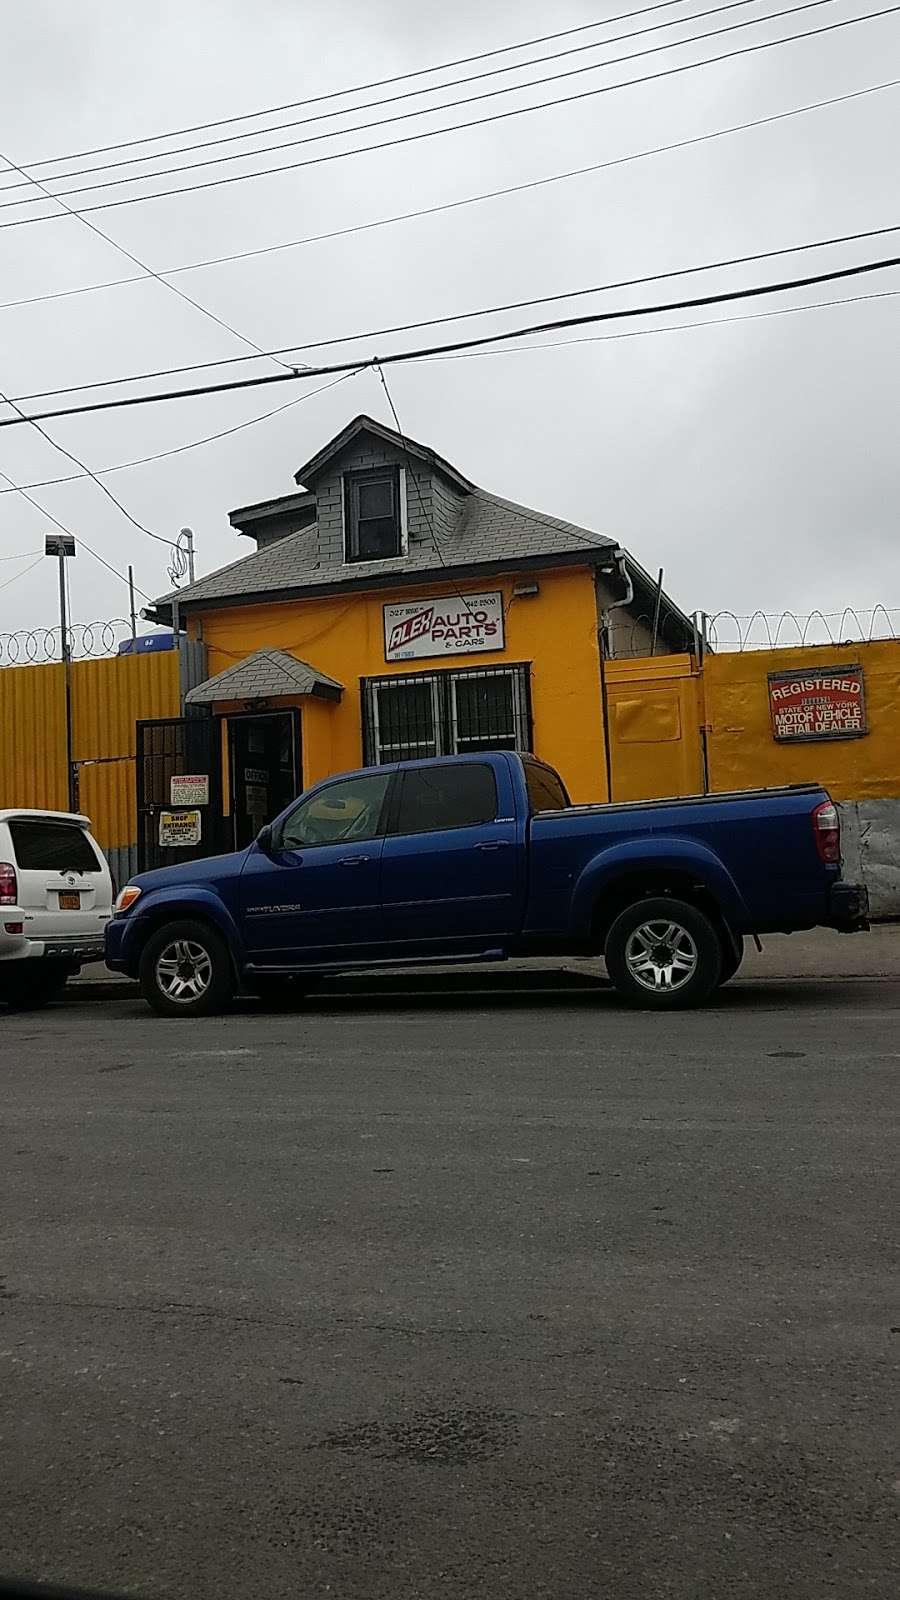 Alex Auto Parts - car repair  | Photo 1 of 2 | Address: 327 Bryant Ave, Bronx, NY 10474, USA | Phone: (718) 842-2500